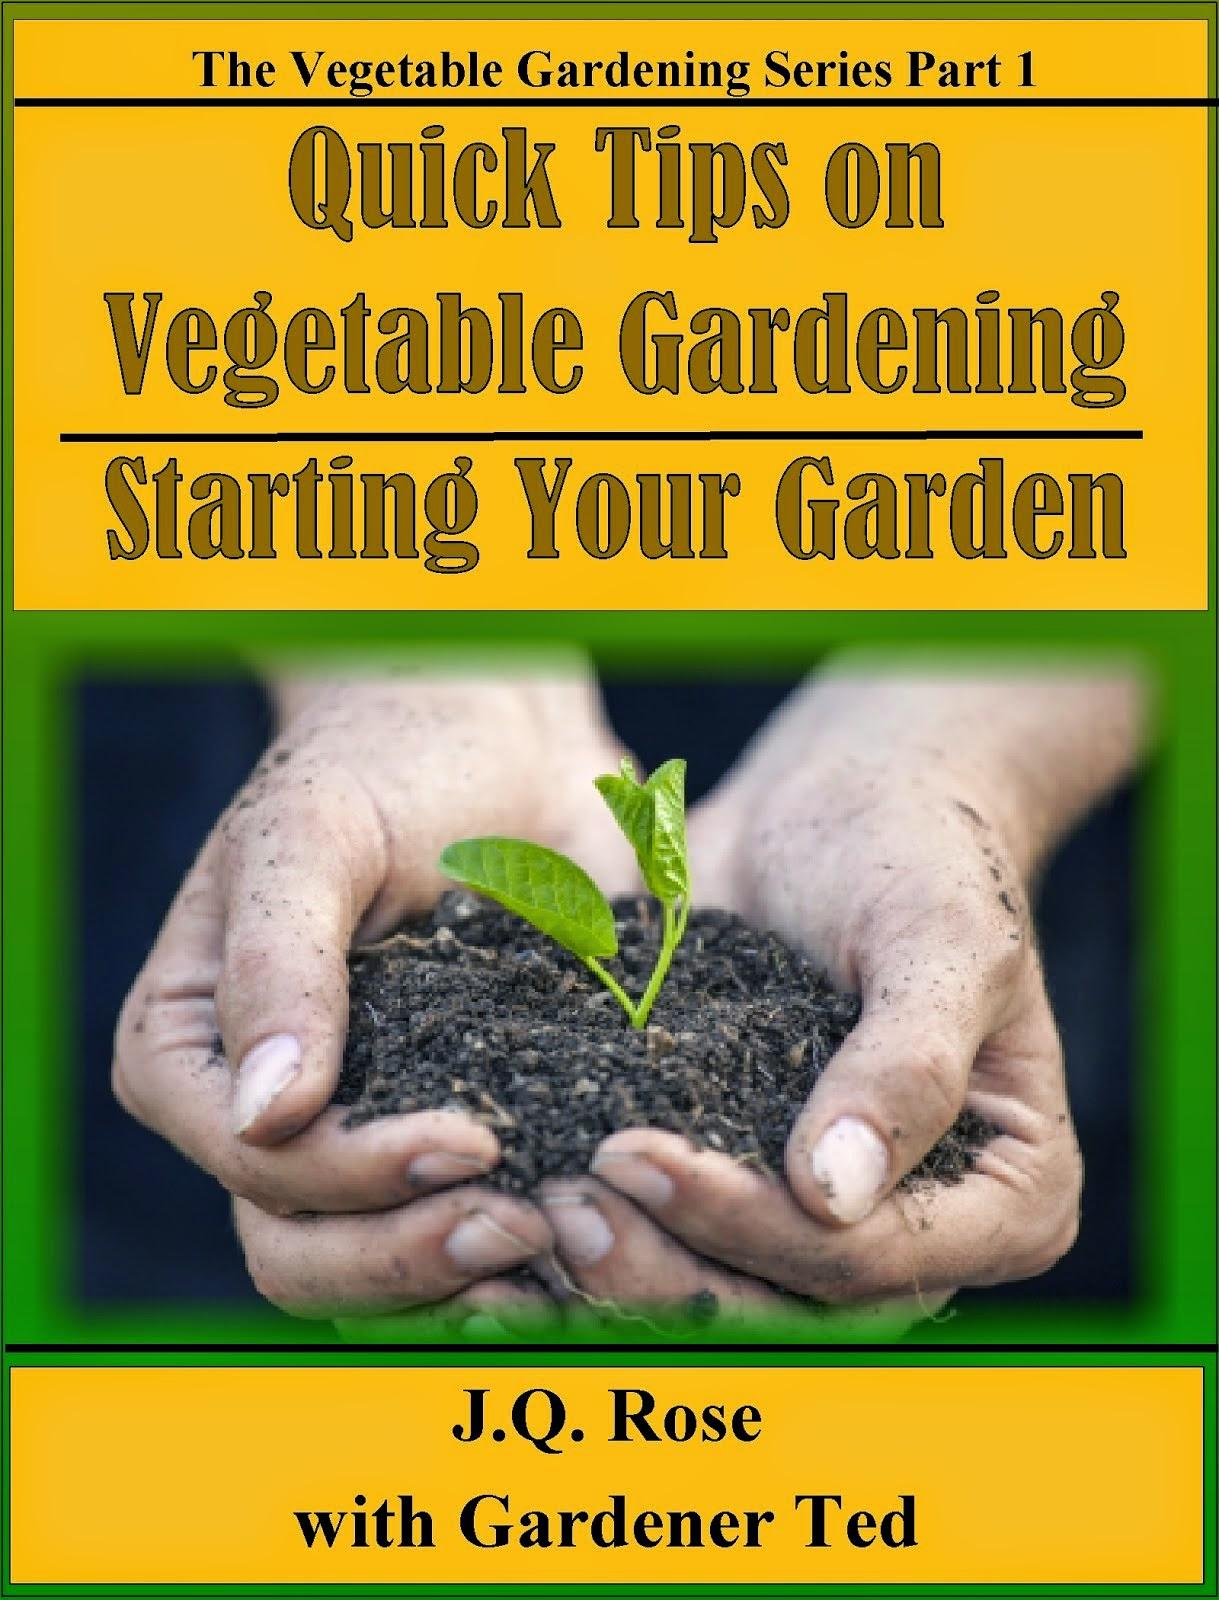 Quick Tips on Vegetable Gardening